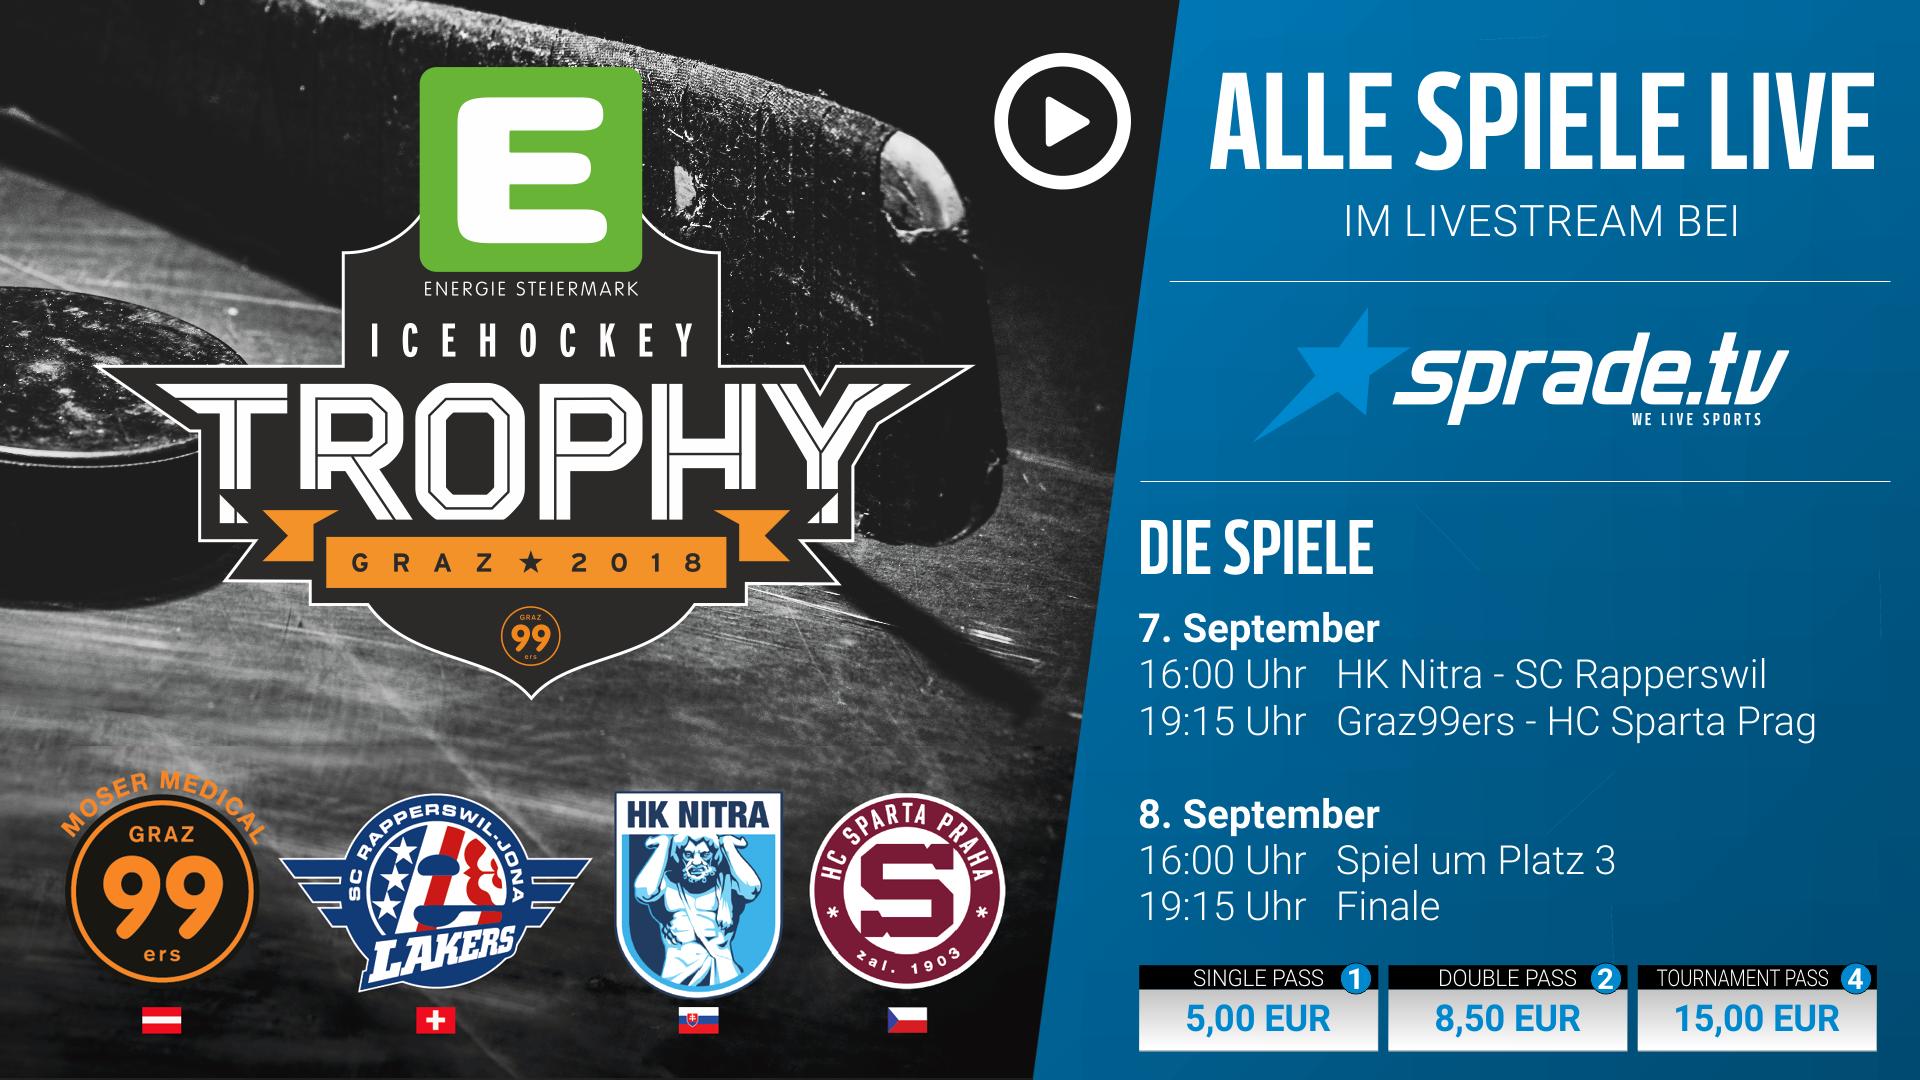 E-Trophy2